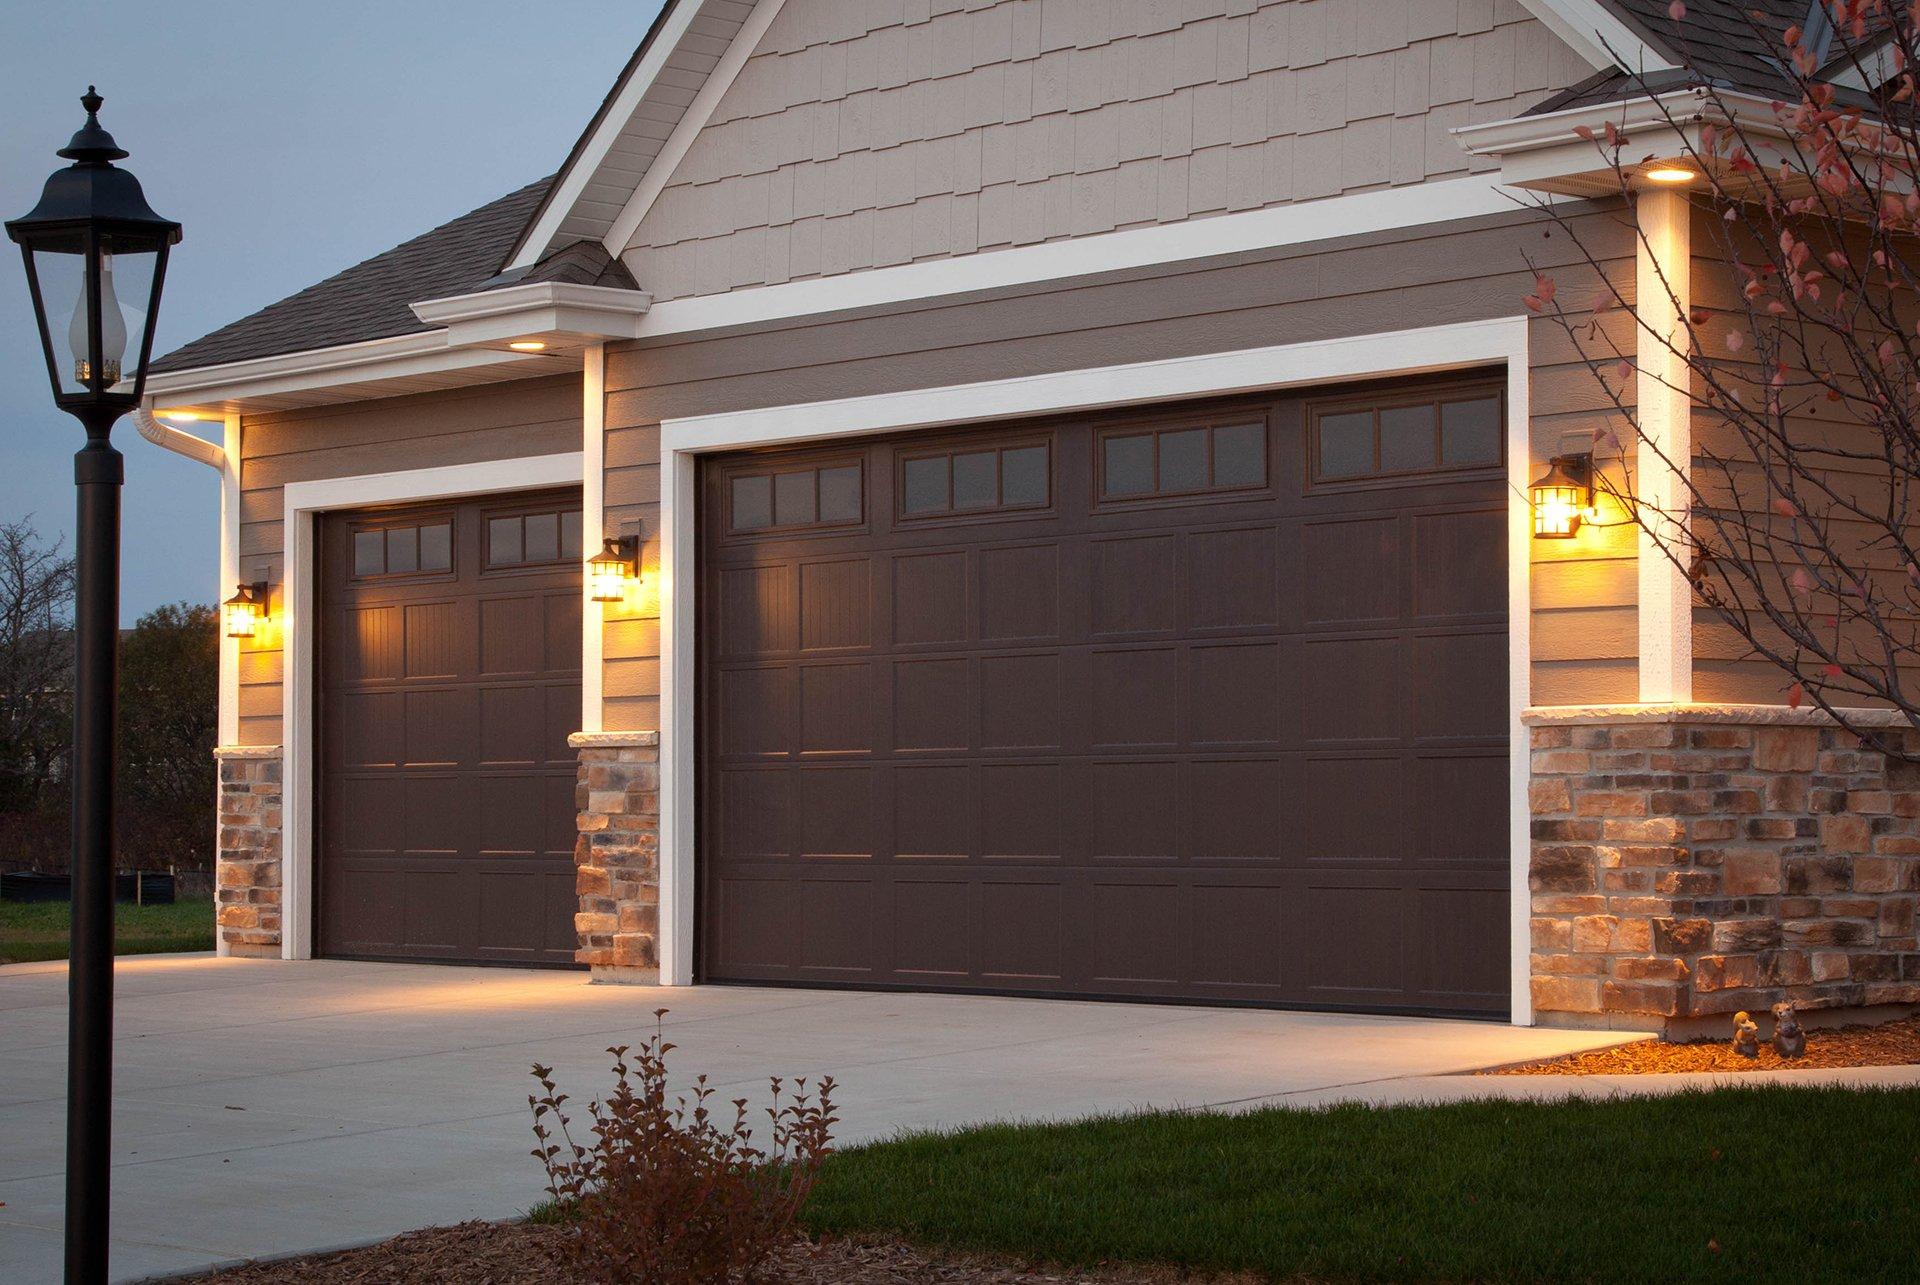 Garage blog by clarks garage door gate repair start the new 2018 year with your garage door in great shape rubansaba